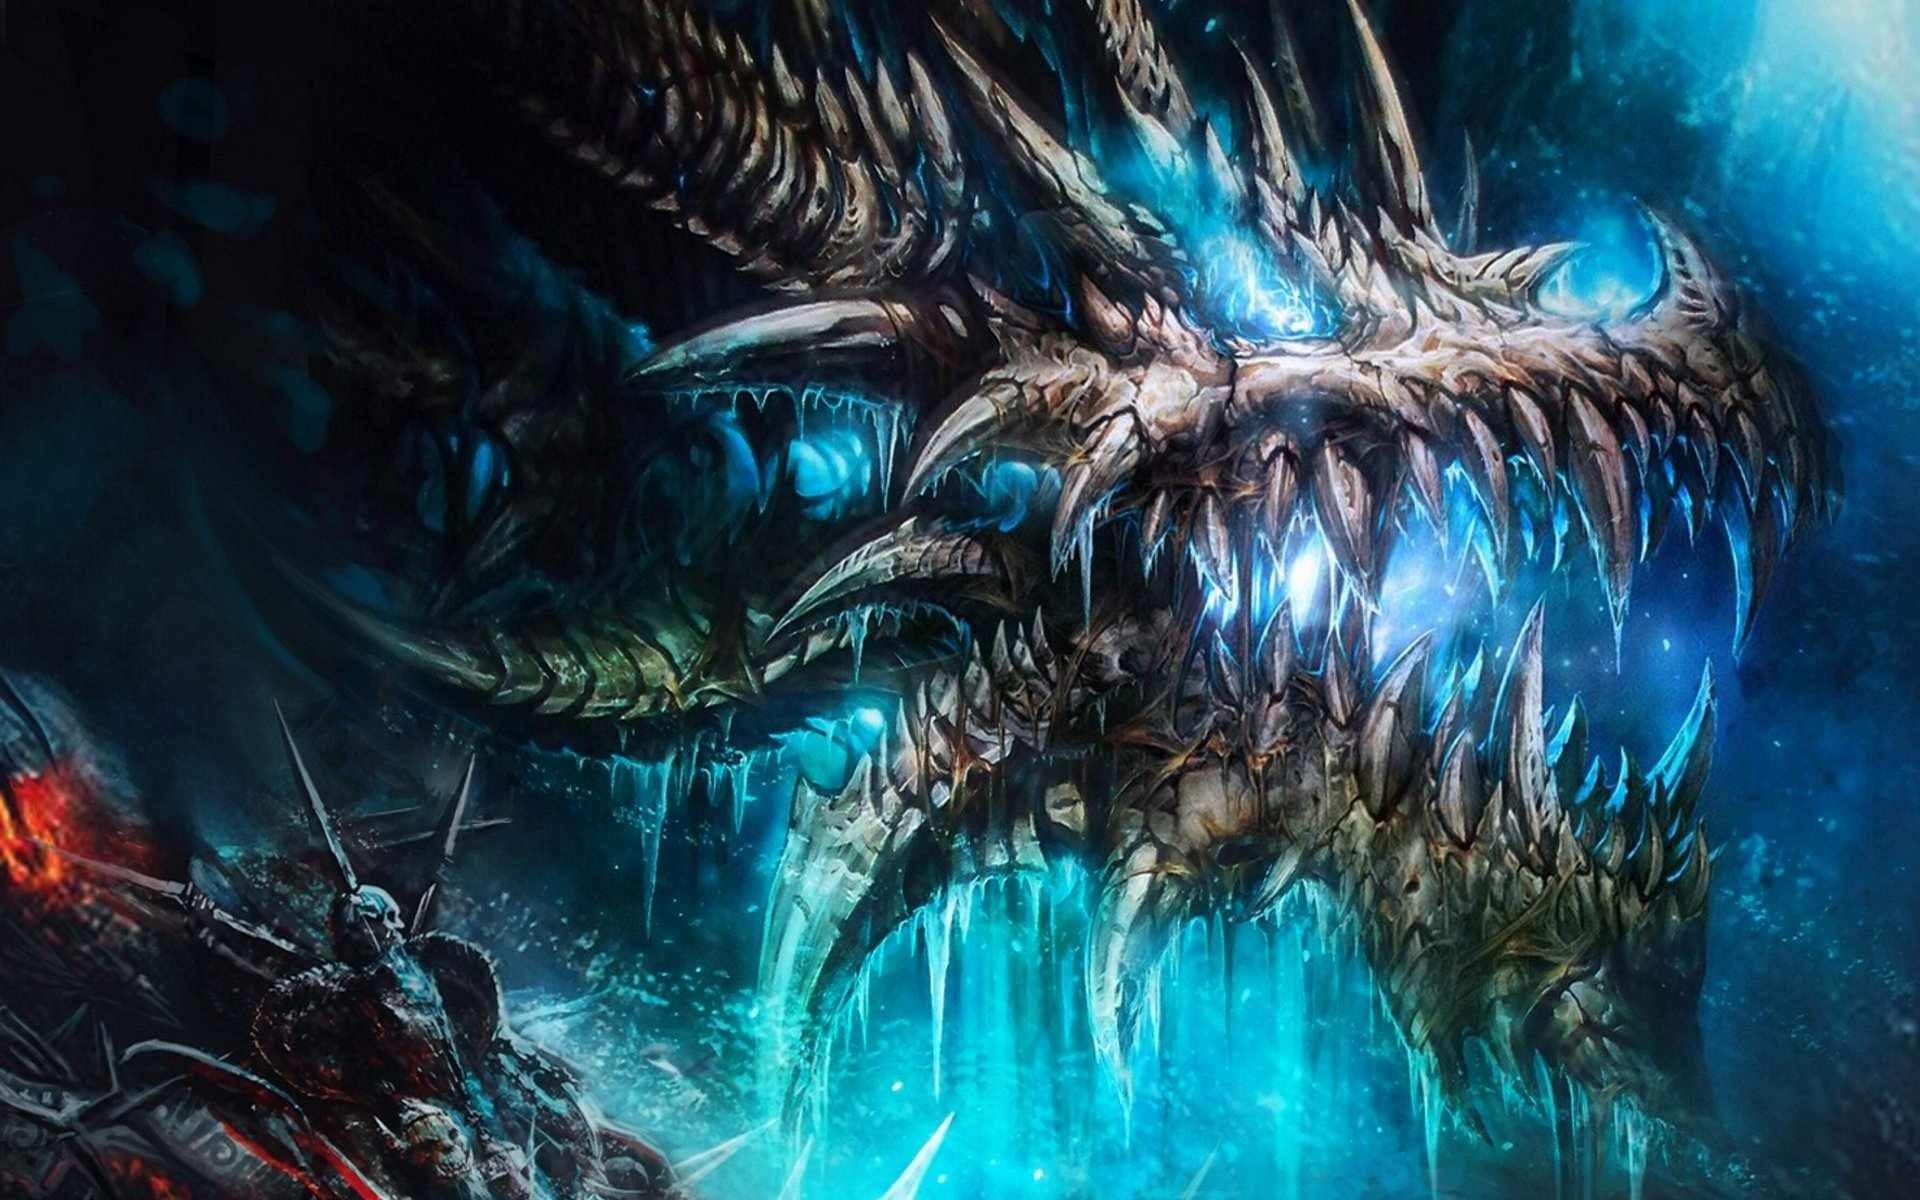 Water Dragon Wallpaper (76+ images)